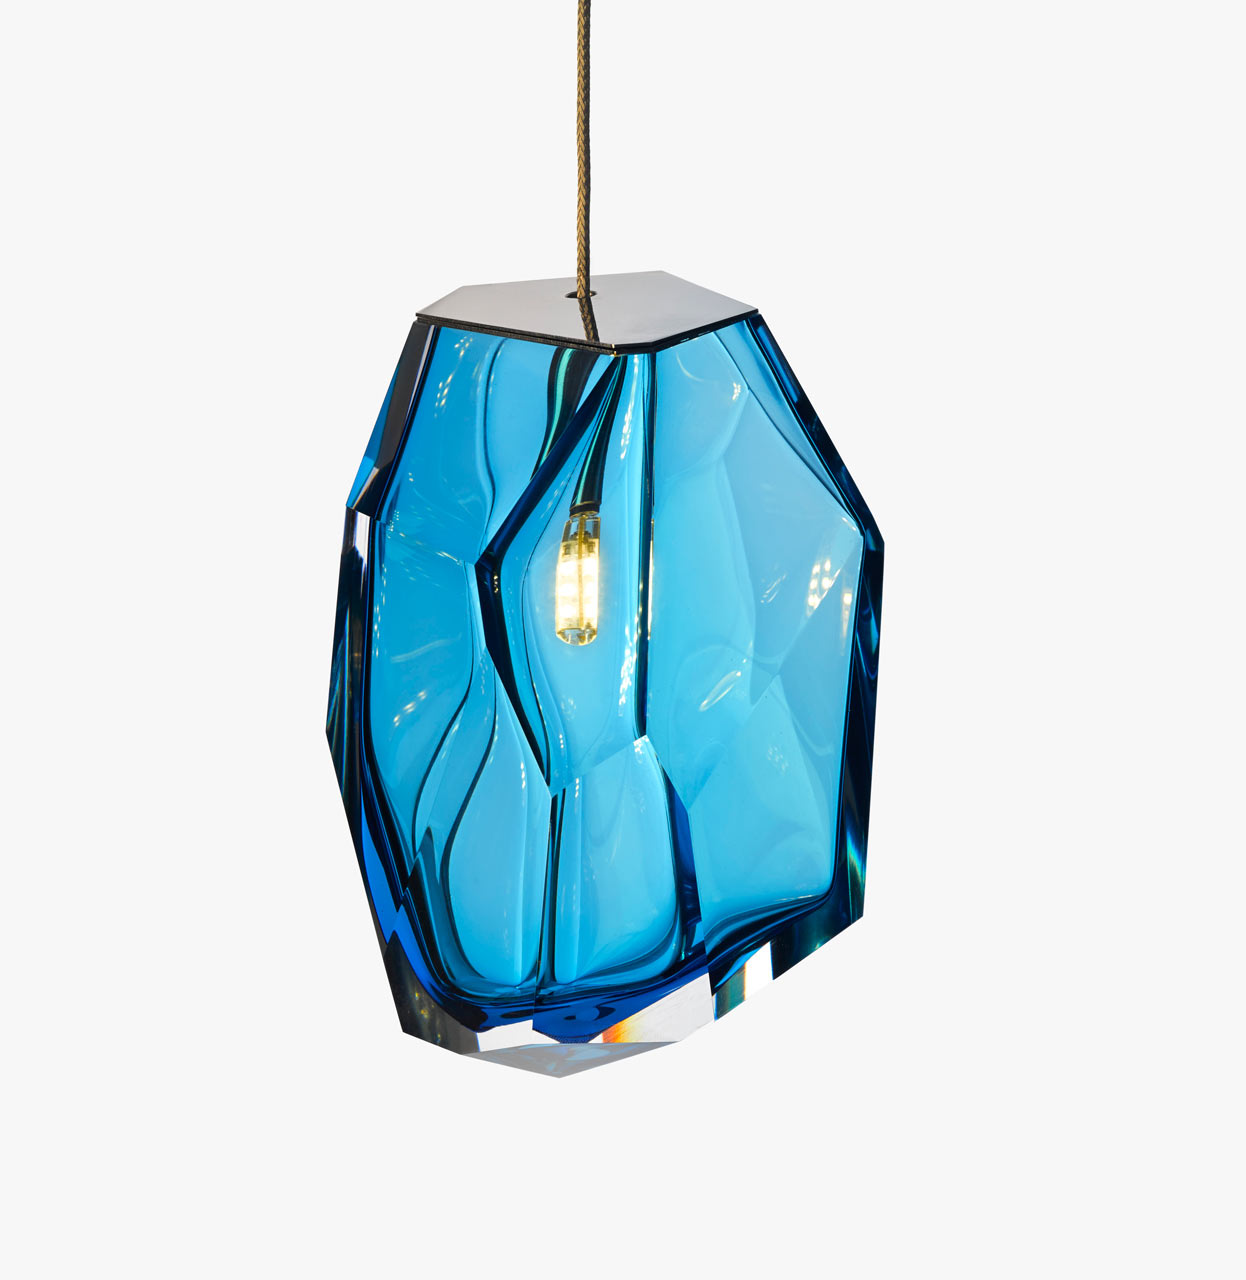 Crystal Rock Lighting Designed By Arik Levy For Lasvit